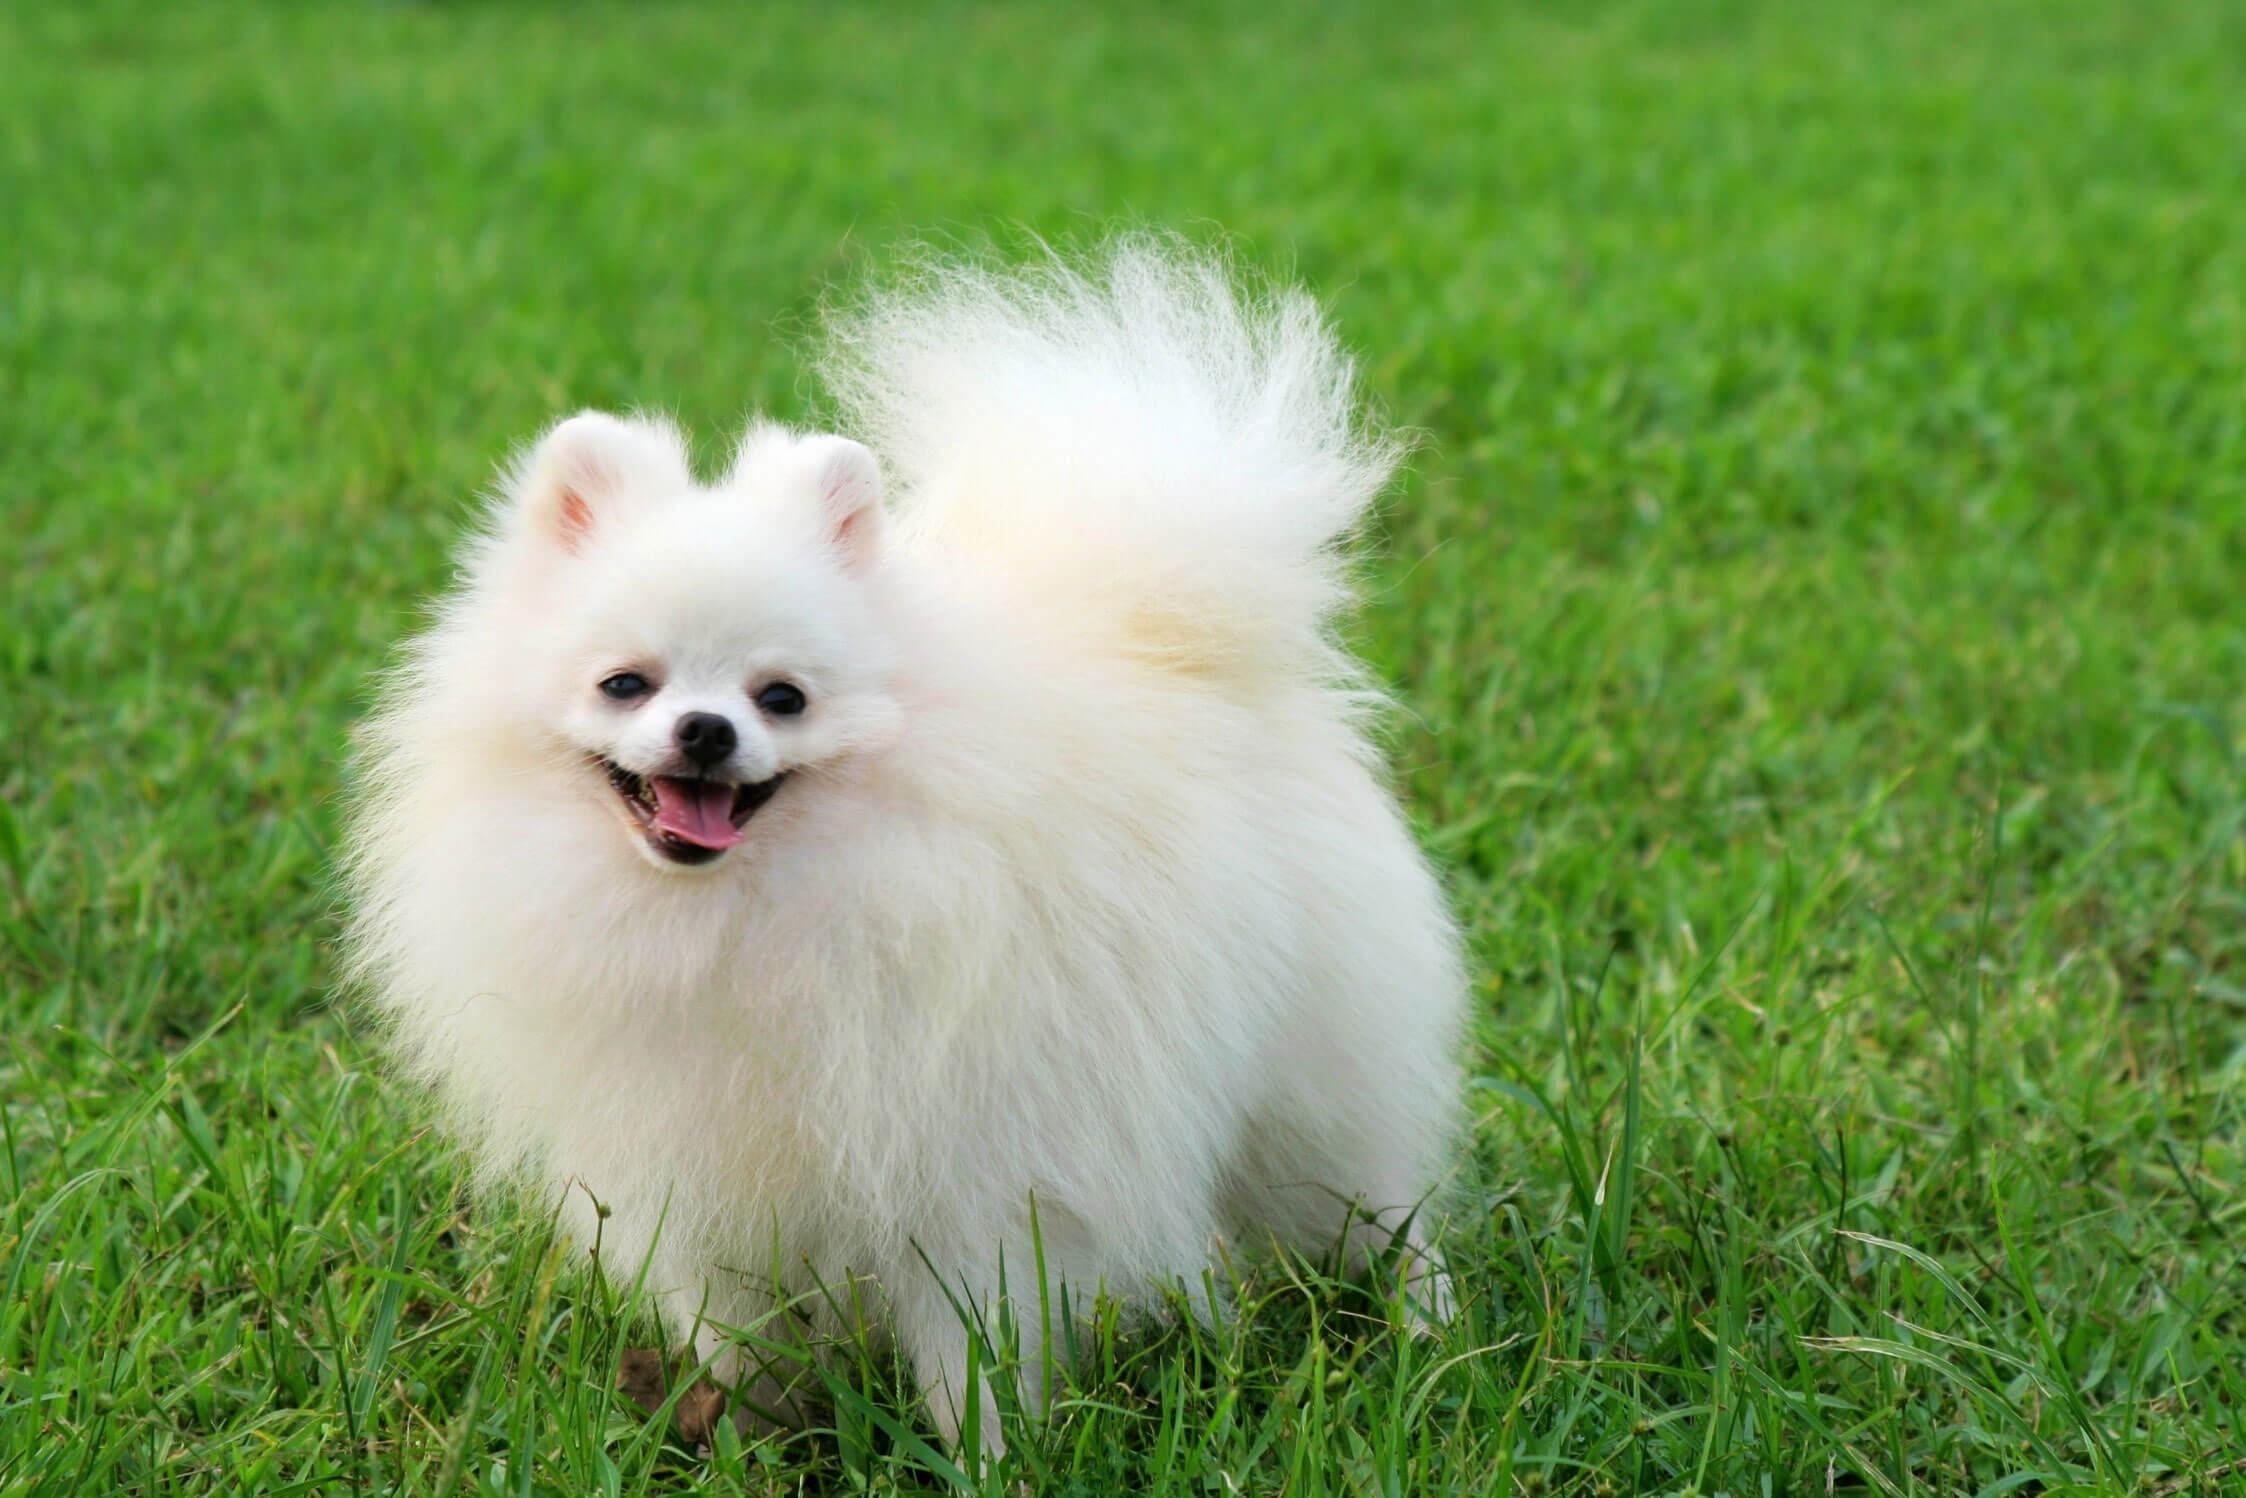 Queen Victorias Beloved Pomeranians  5Minute History